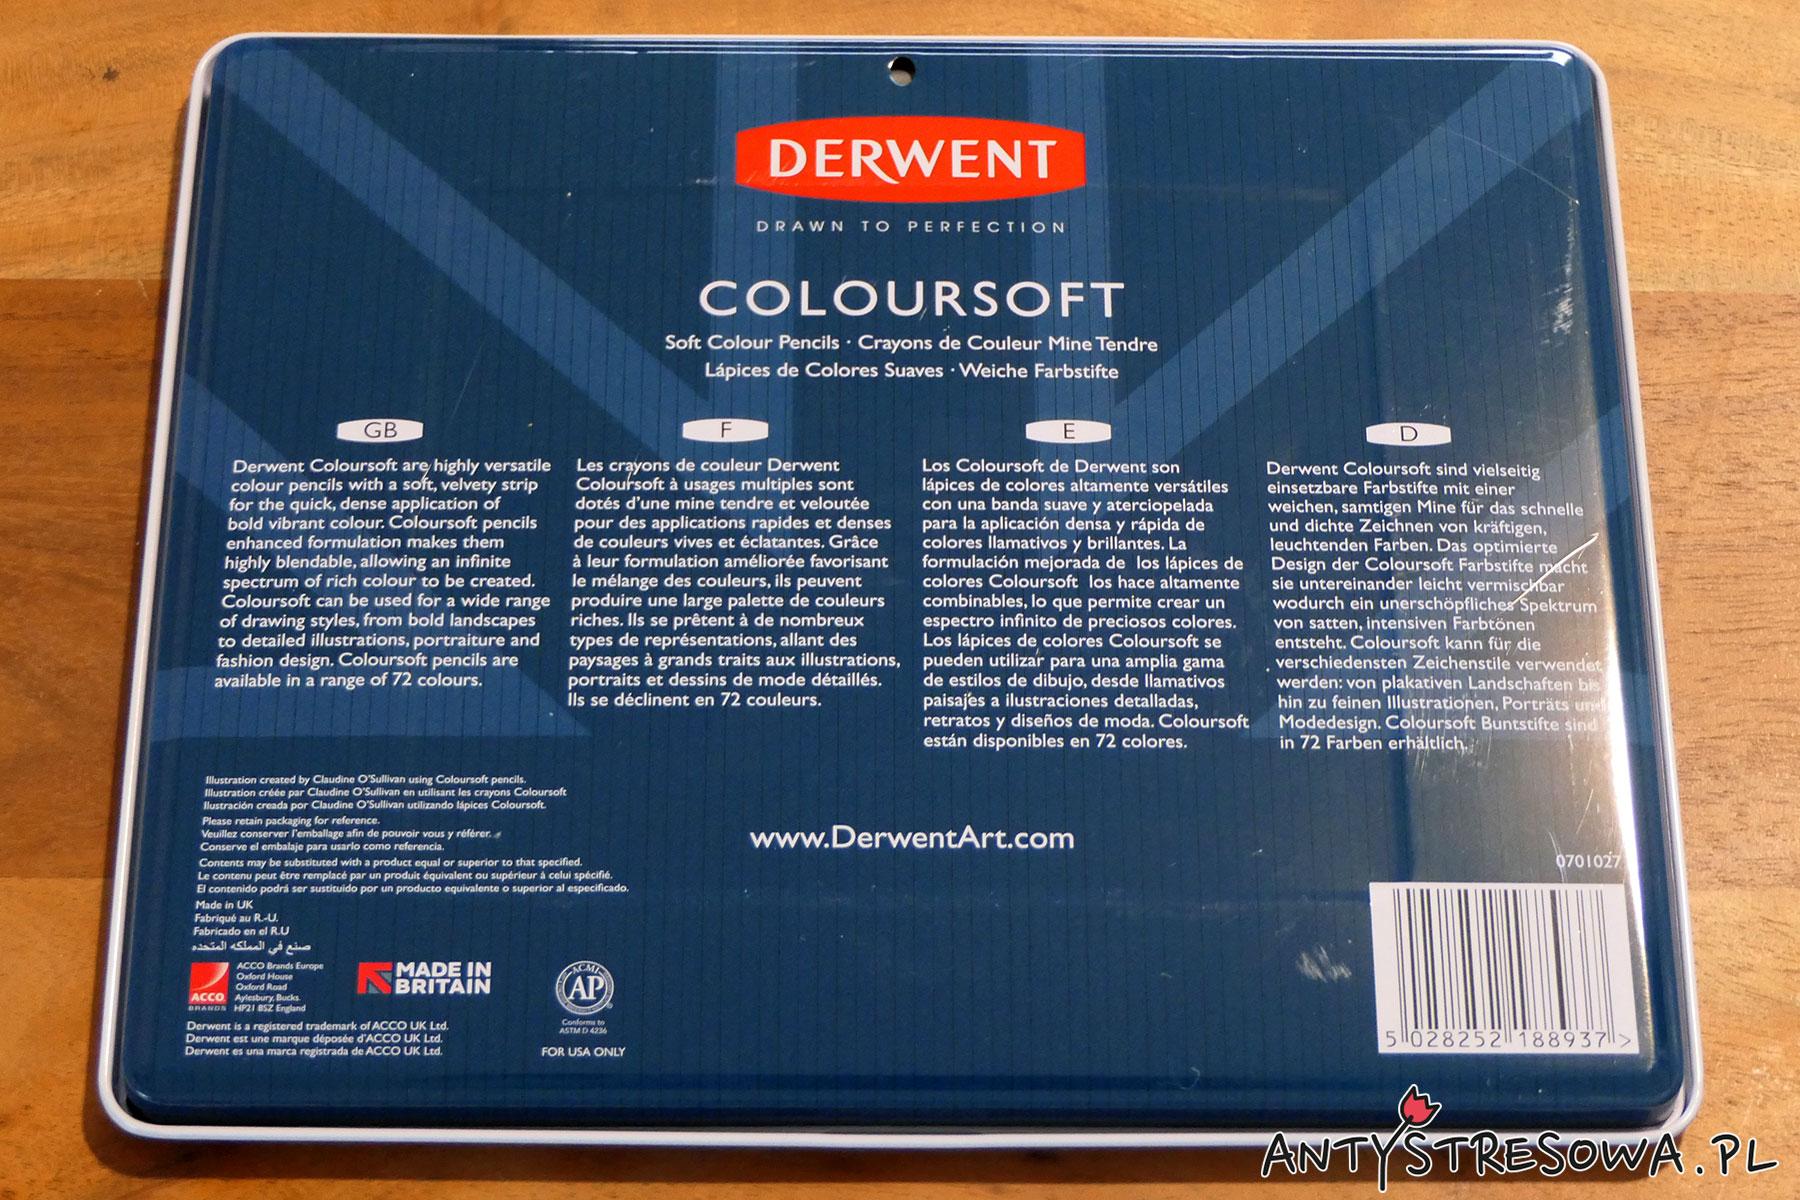 Opakowanie kredek Derwent Coloursft